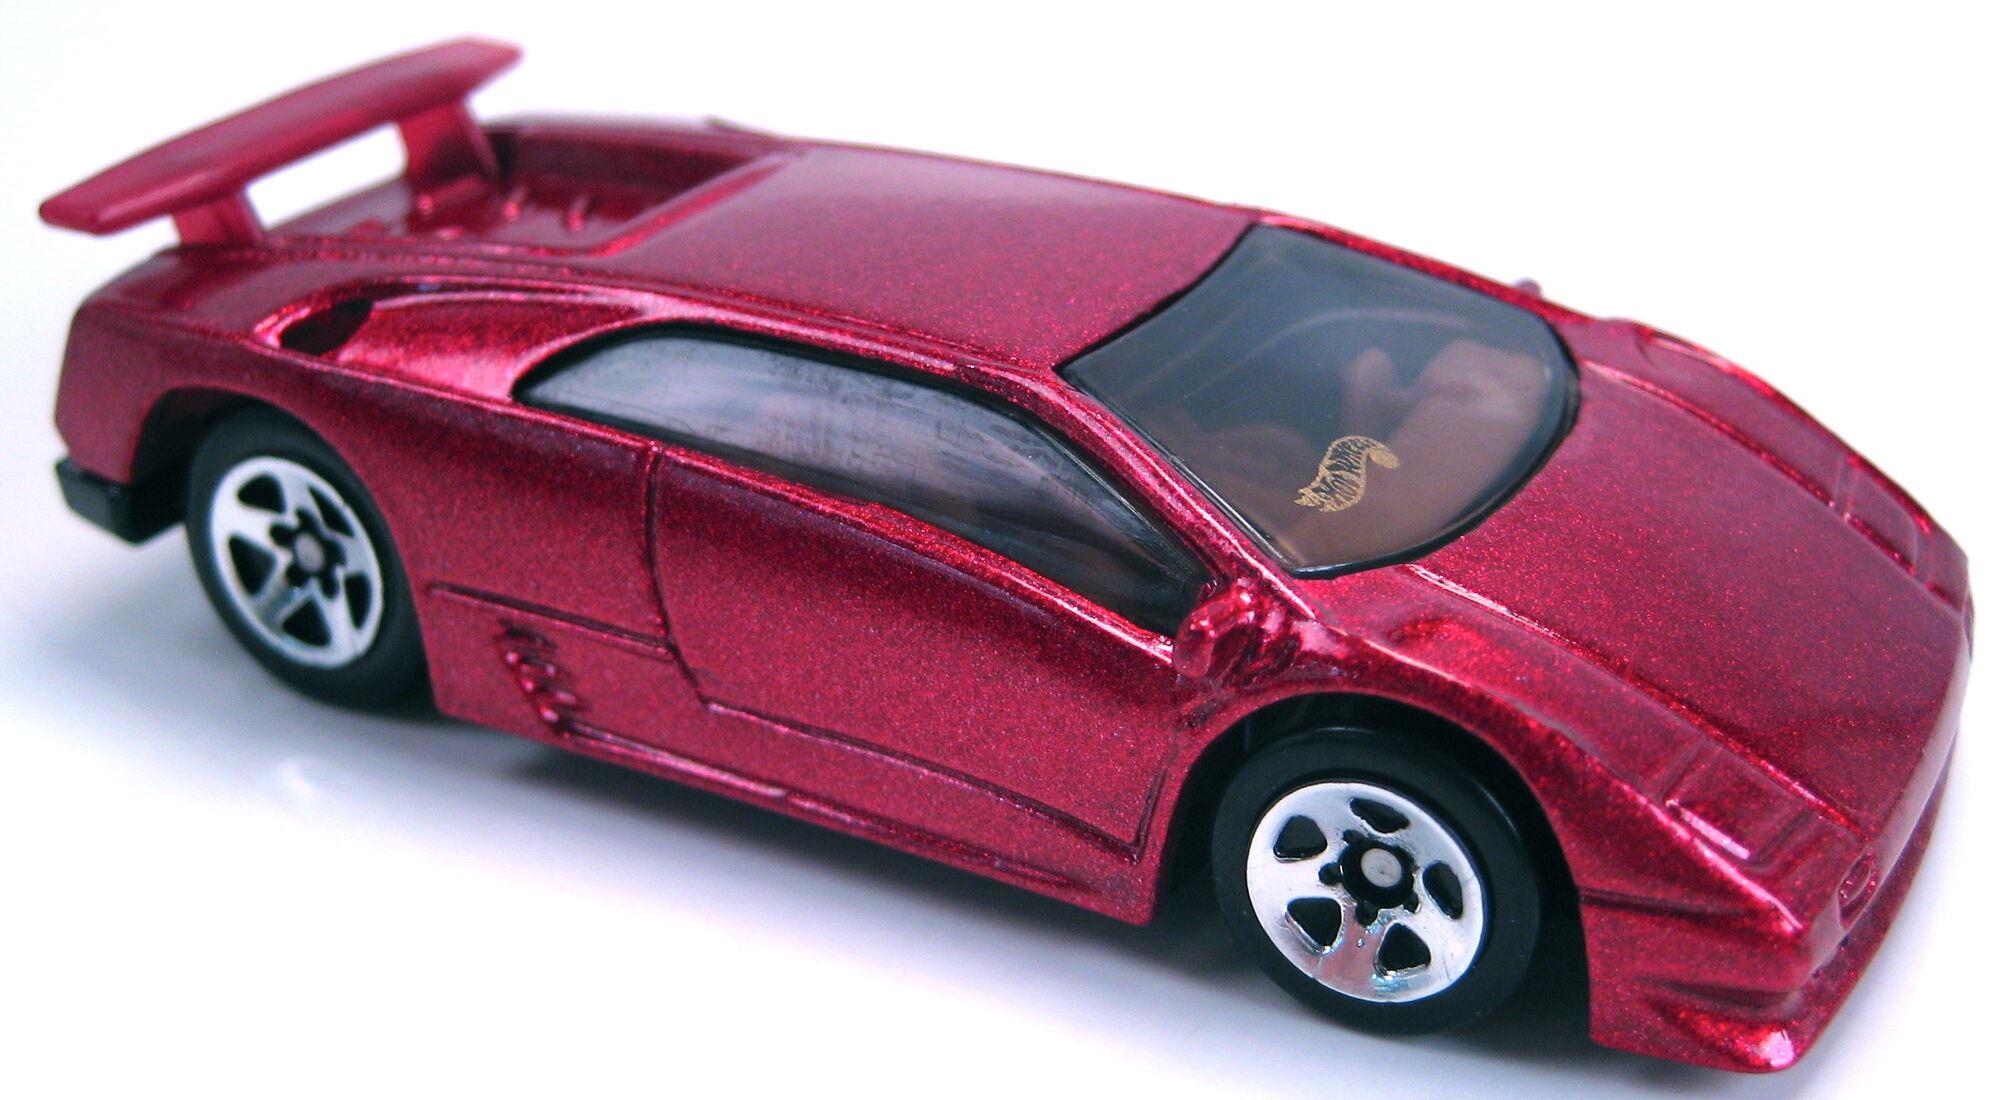 Lamborghini Diablo | Hot Wheels Wiki | FANDOM powered by Wikia on 1998 lamborghini concept, 1998 lamborghini cars, ferrari diablo, 1998 lamborghini murcielago, 1998 lamborghini gallardo, 1998 lamborghini sv,